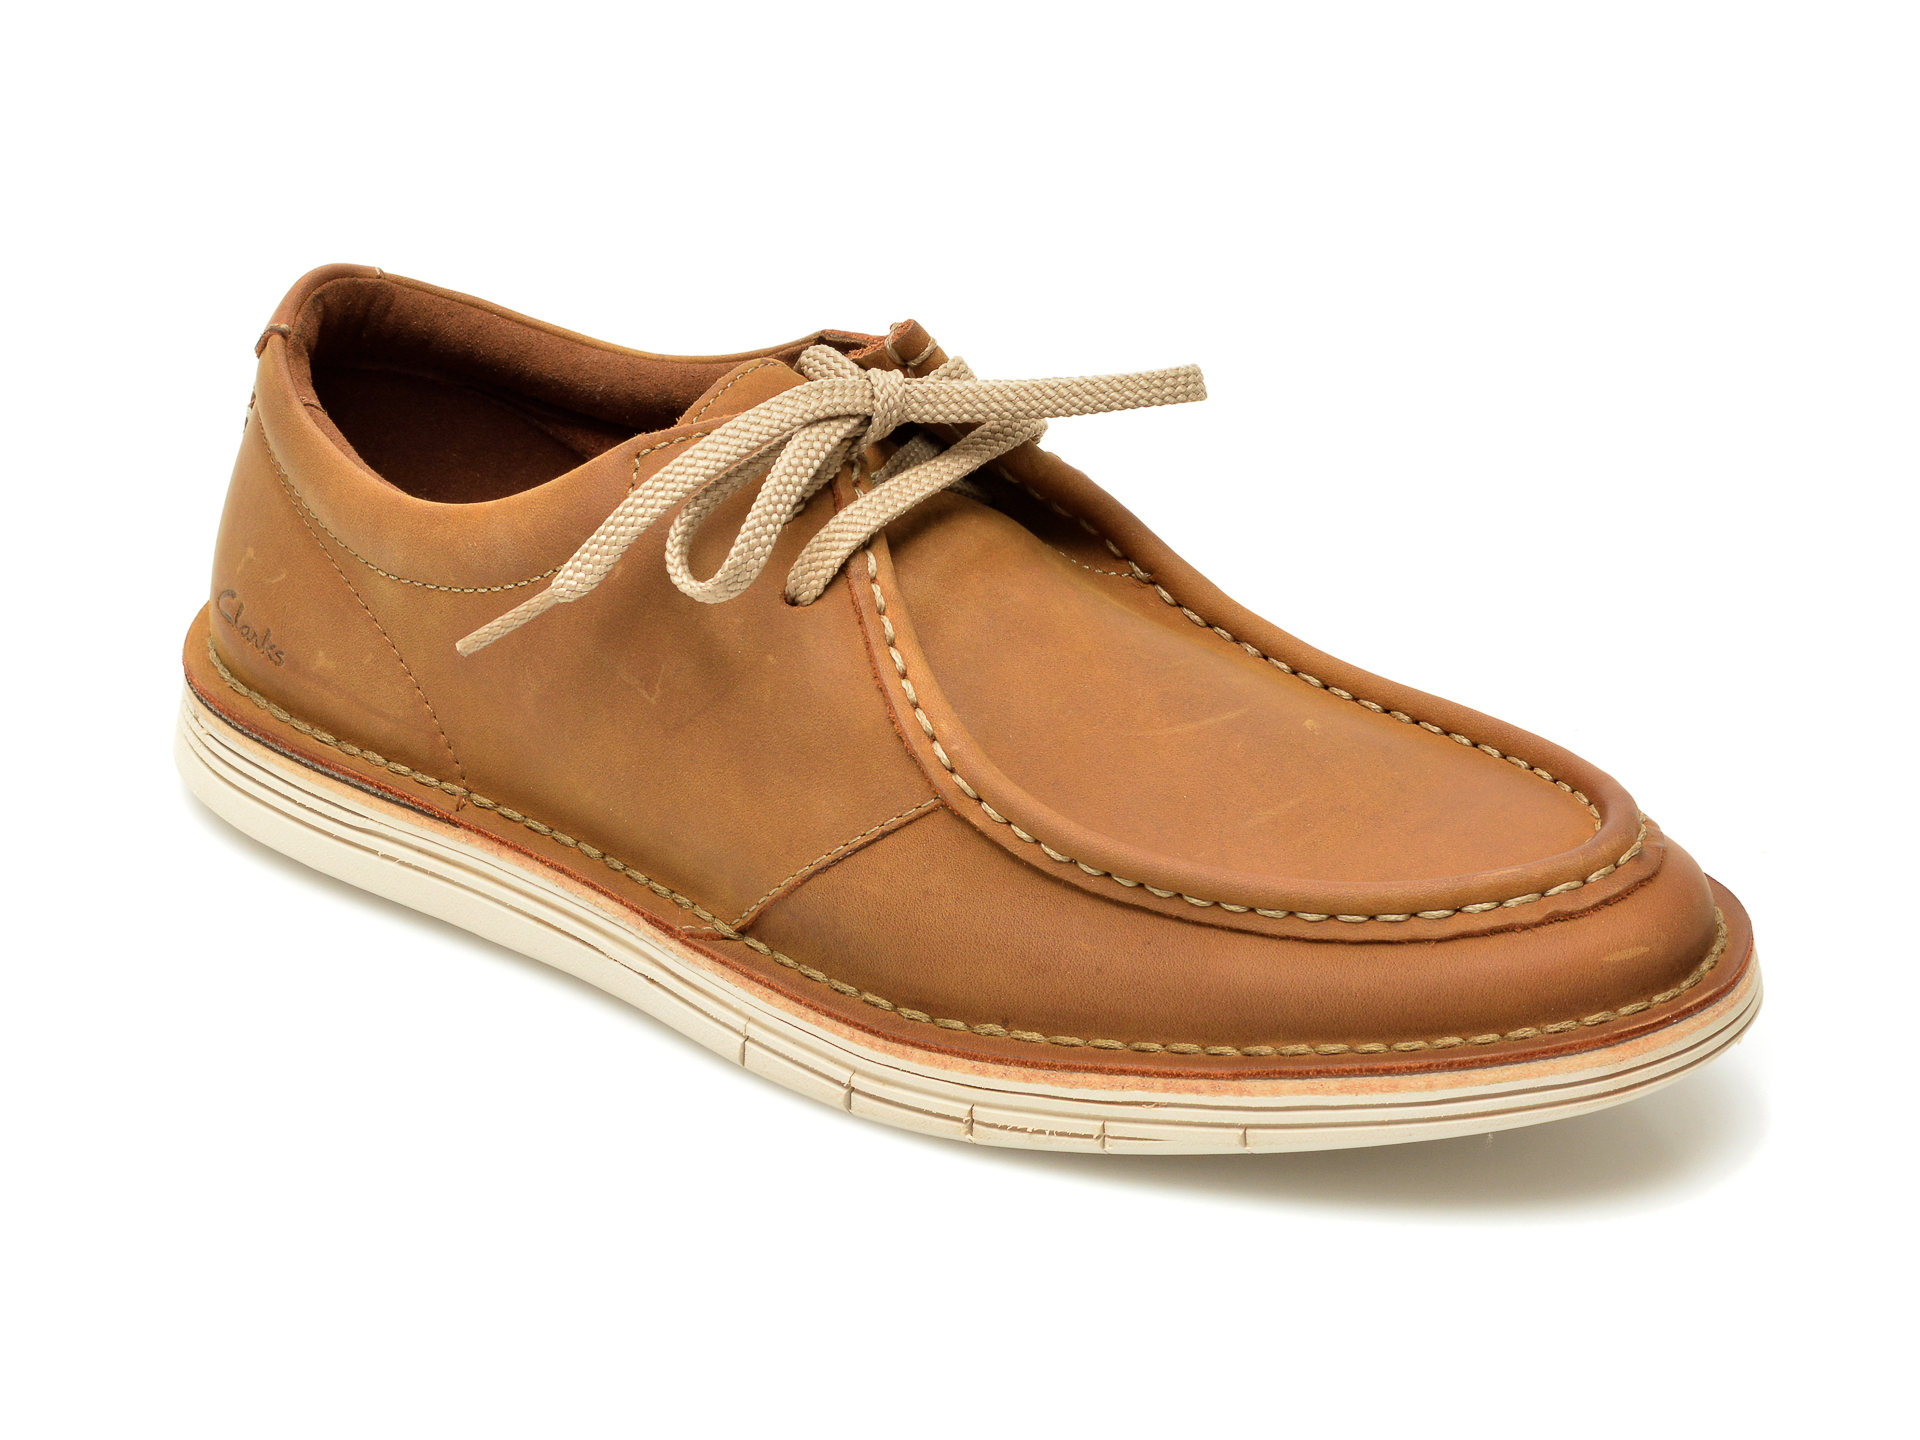 Pantofi CLARKS maro, Forge Run, din nabuc imagine